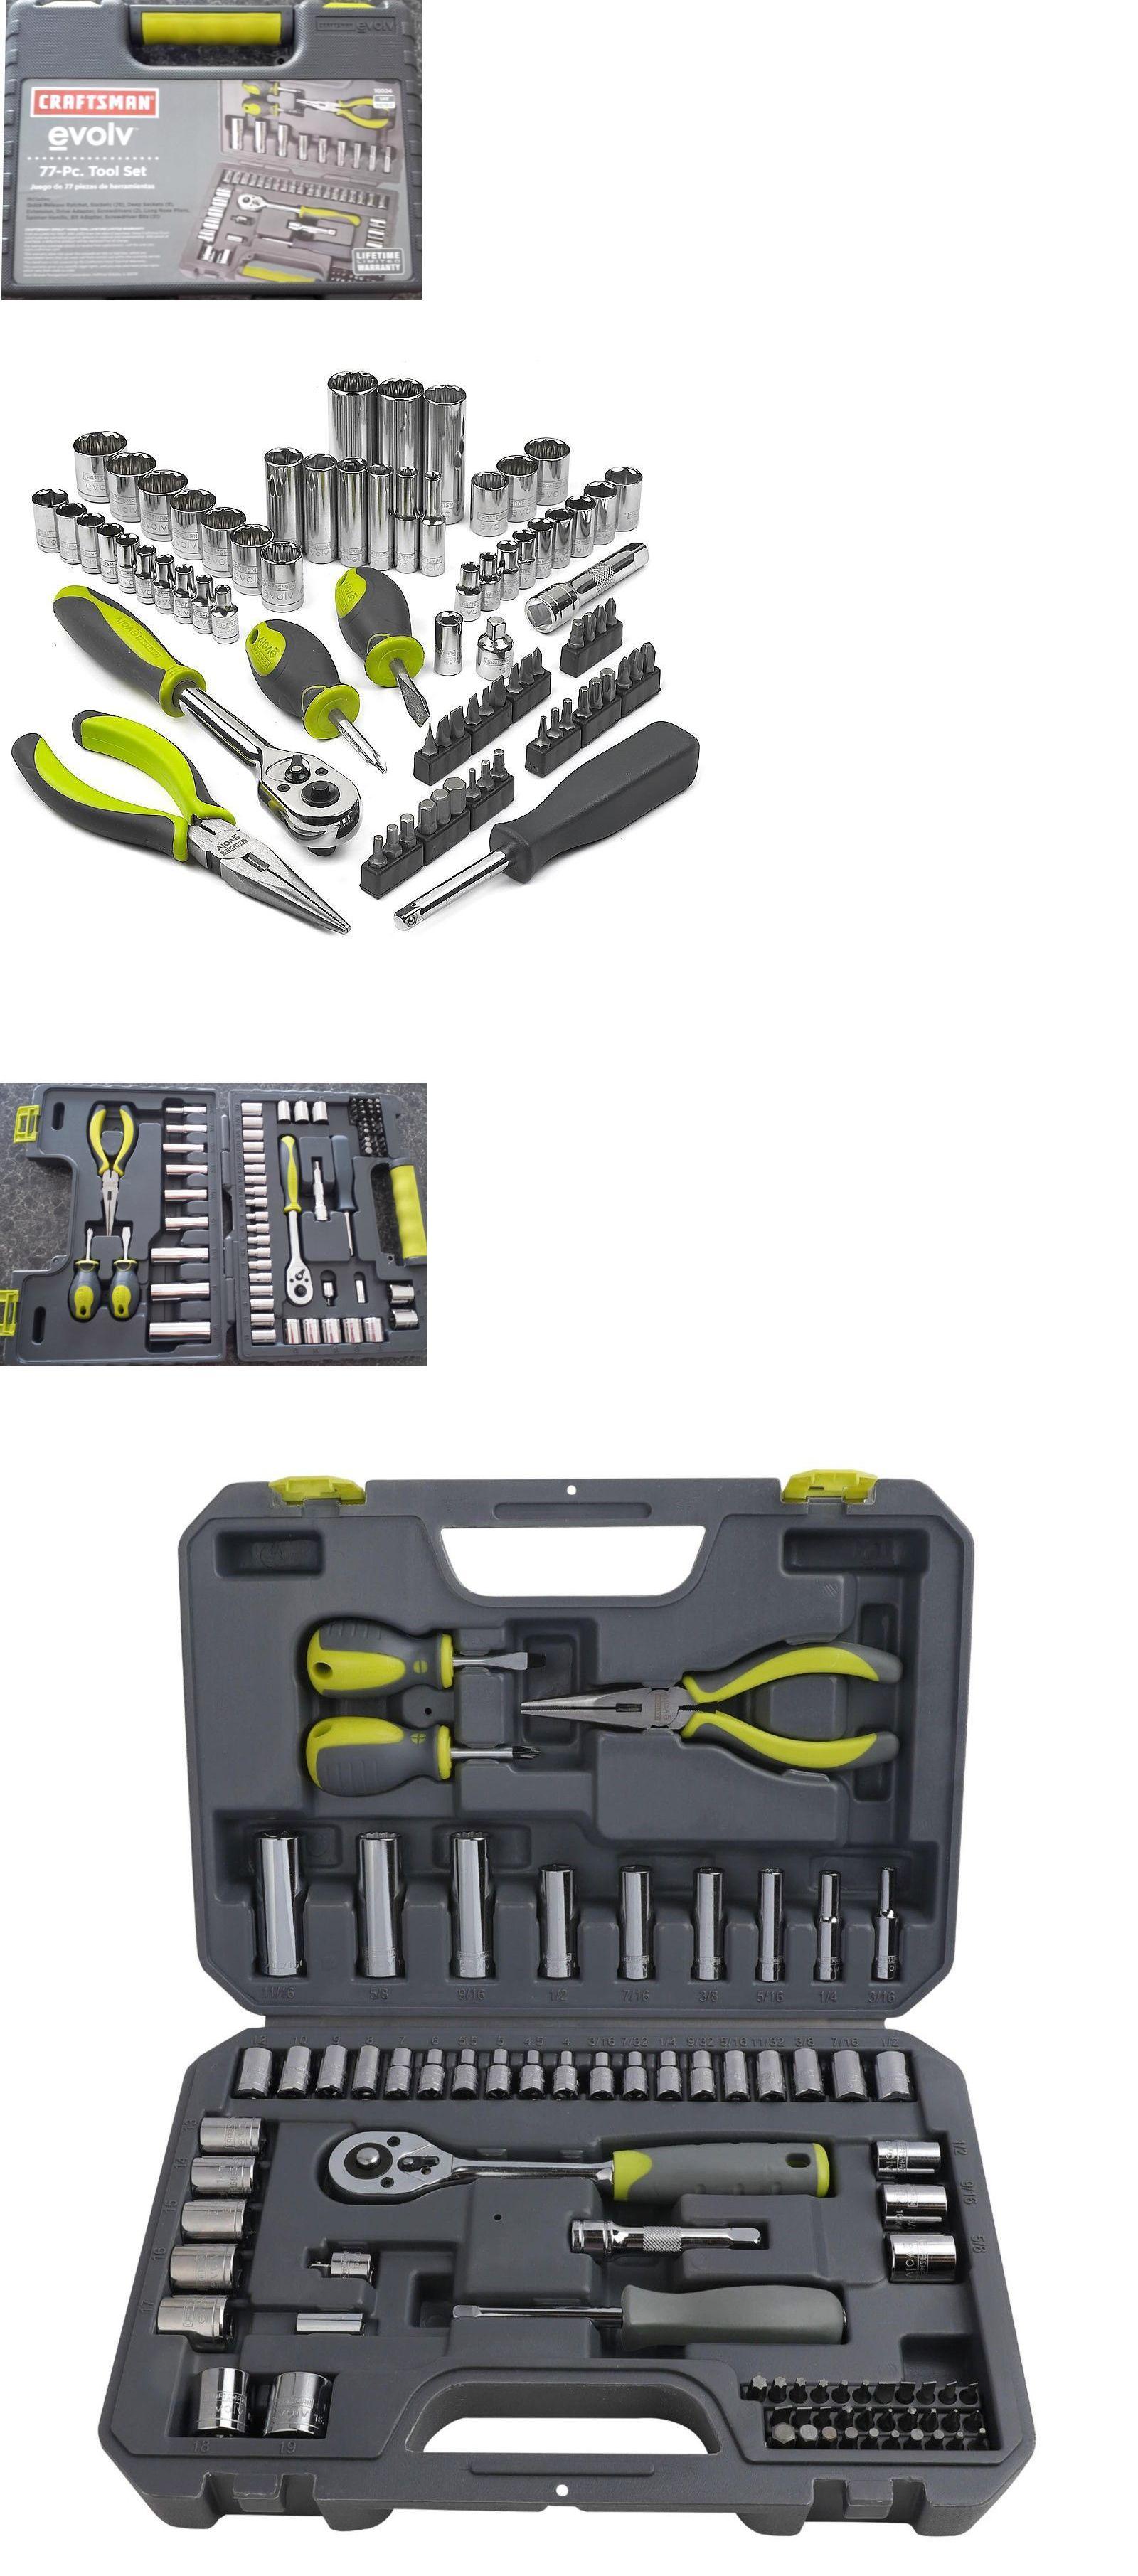 Craftsman Evolv 7 pc Hex Bit Socket Set INCH SAE